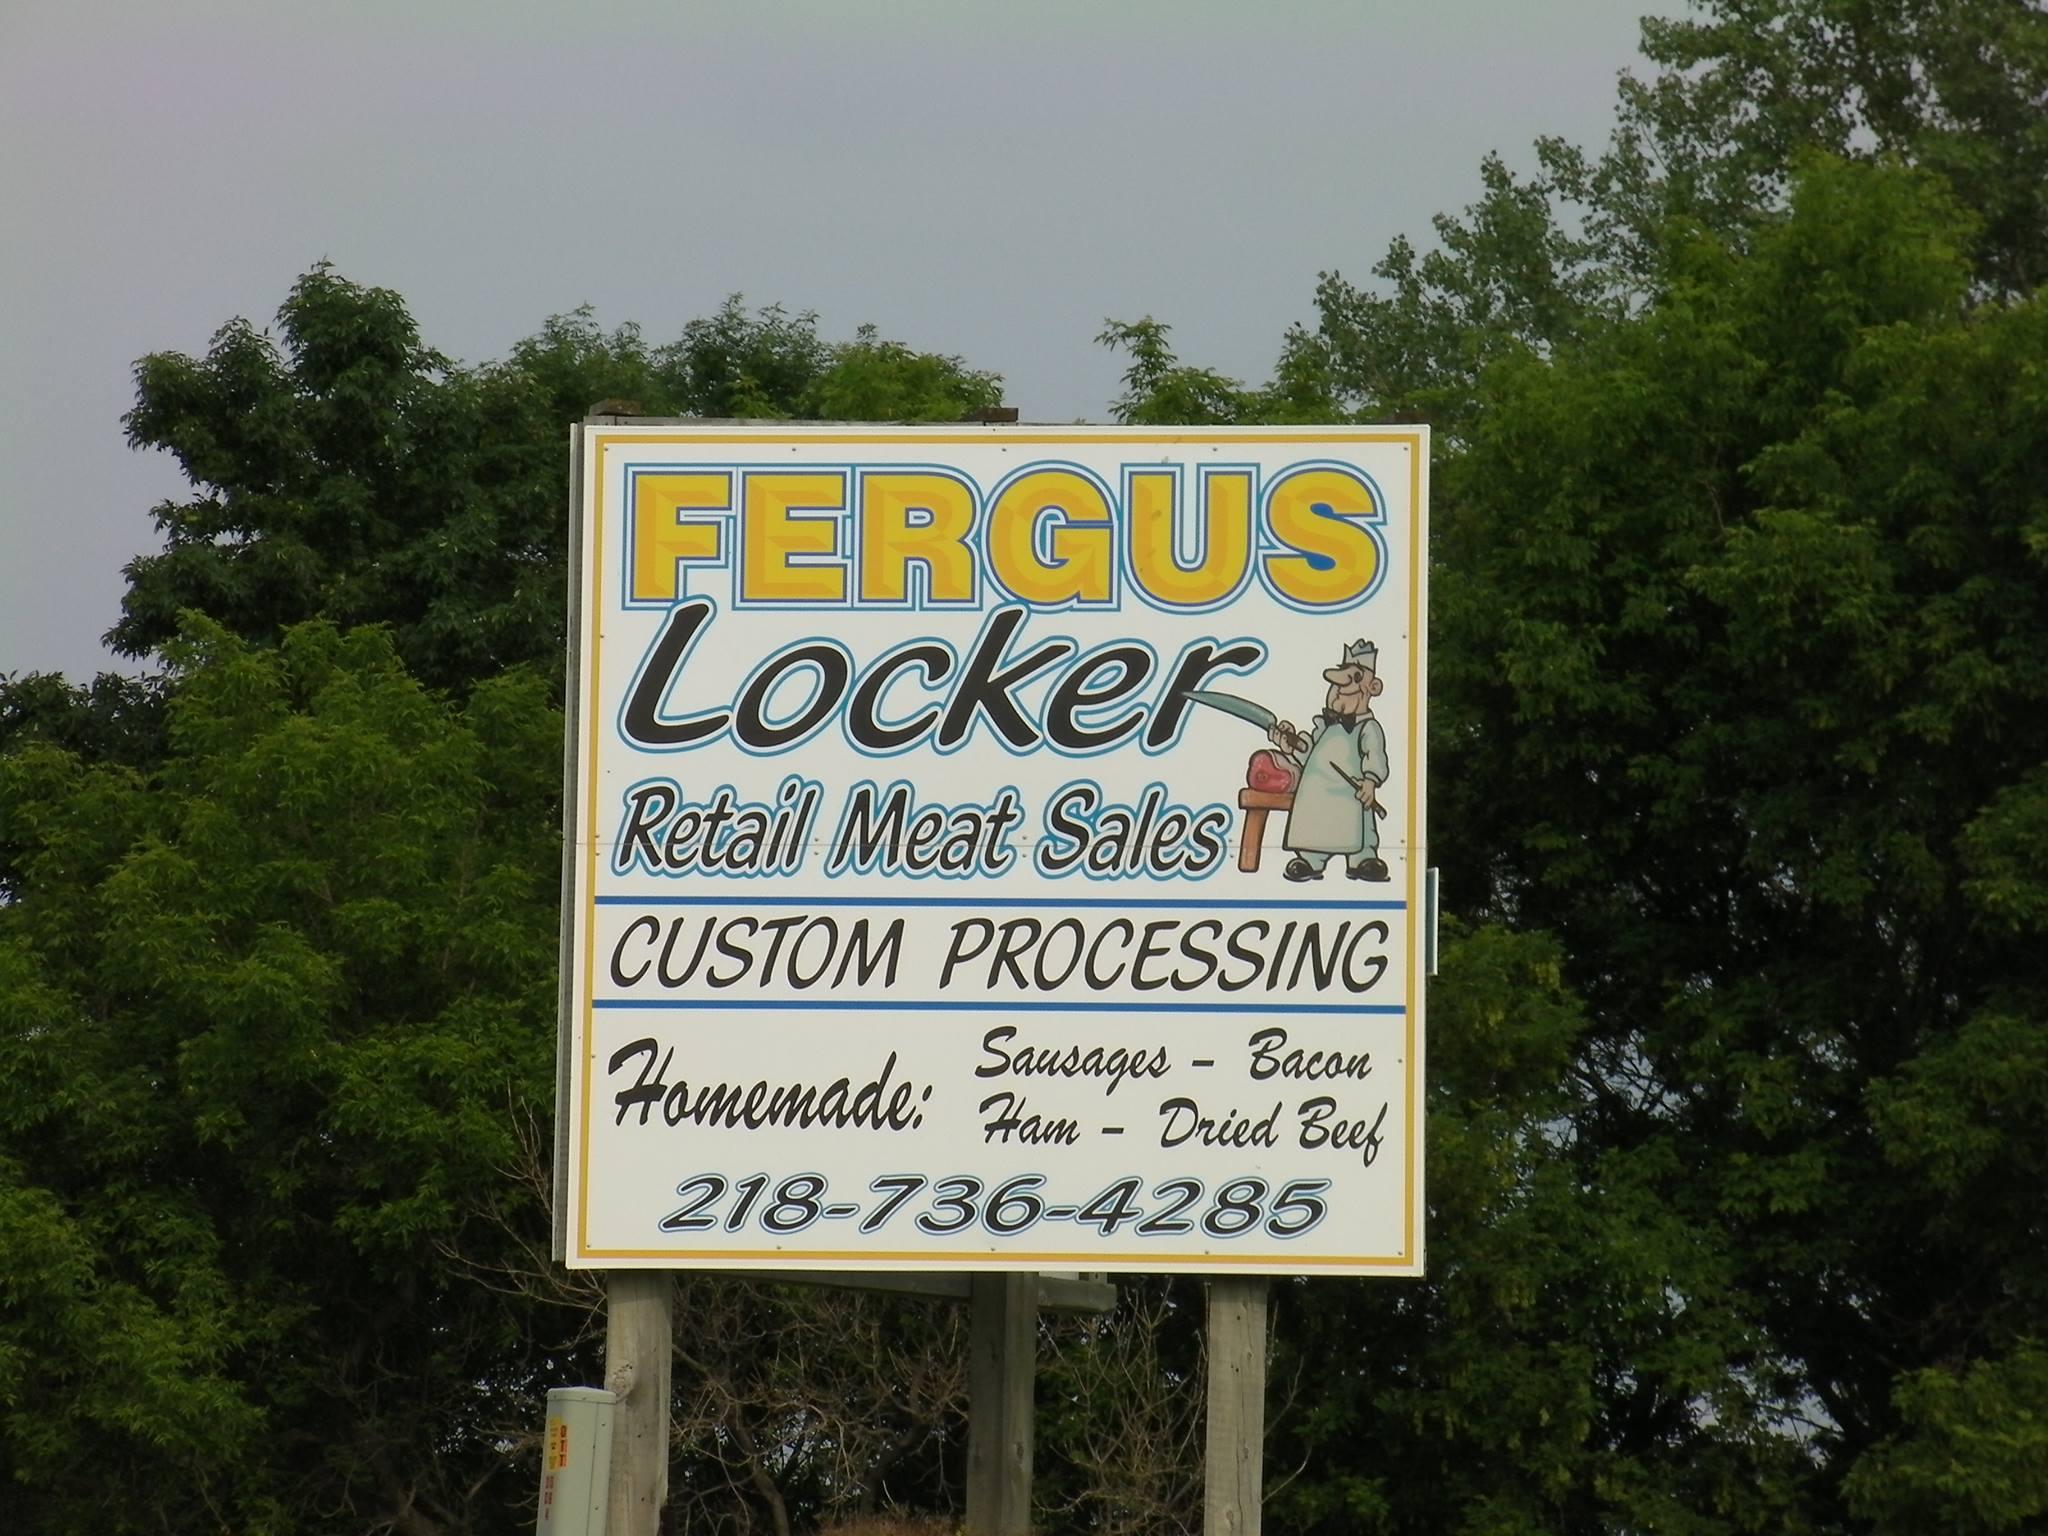 Fergus Locker